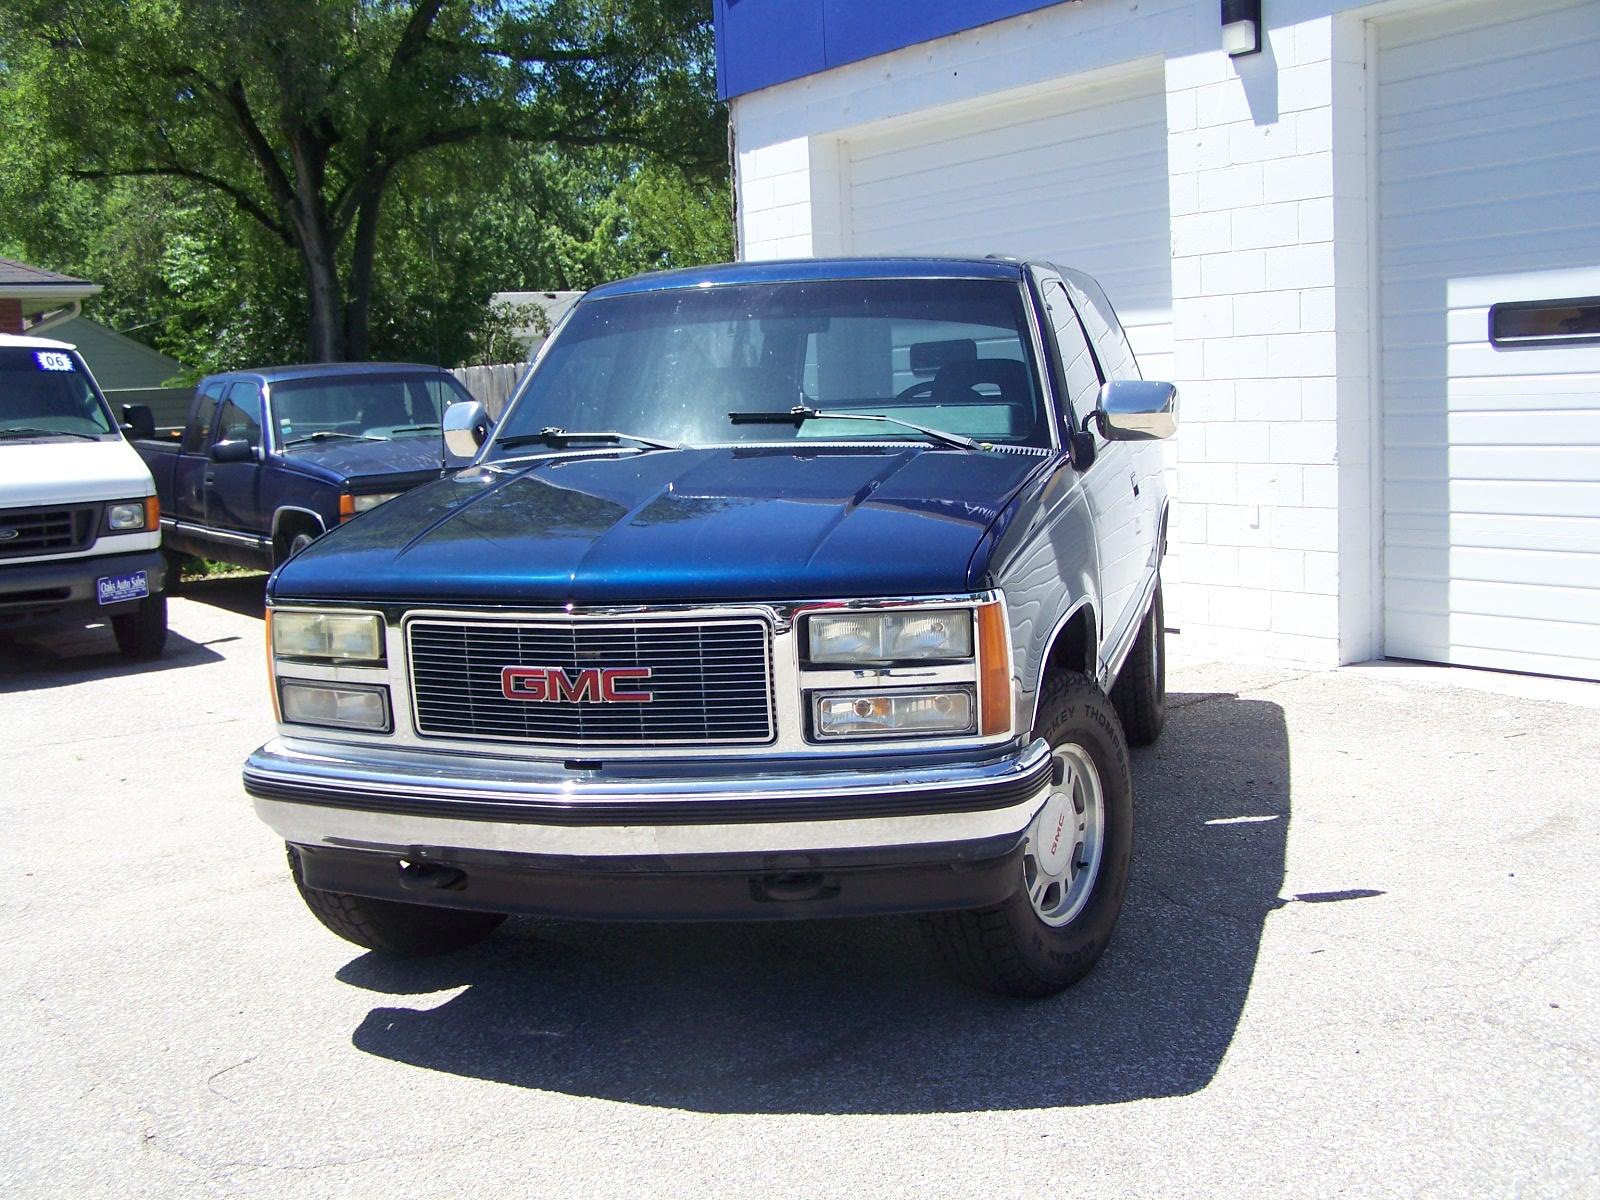 1993 GMC Yukon 001.JPG